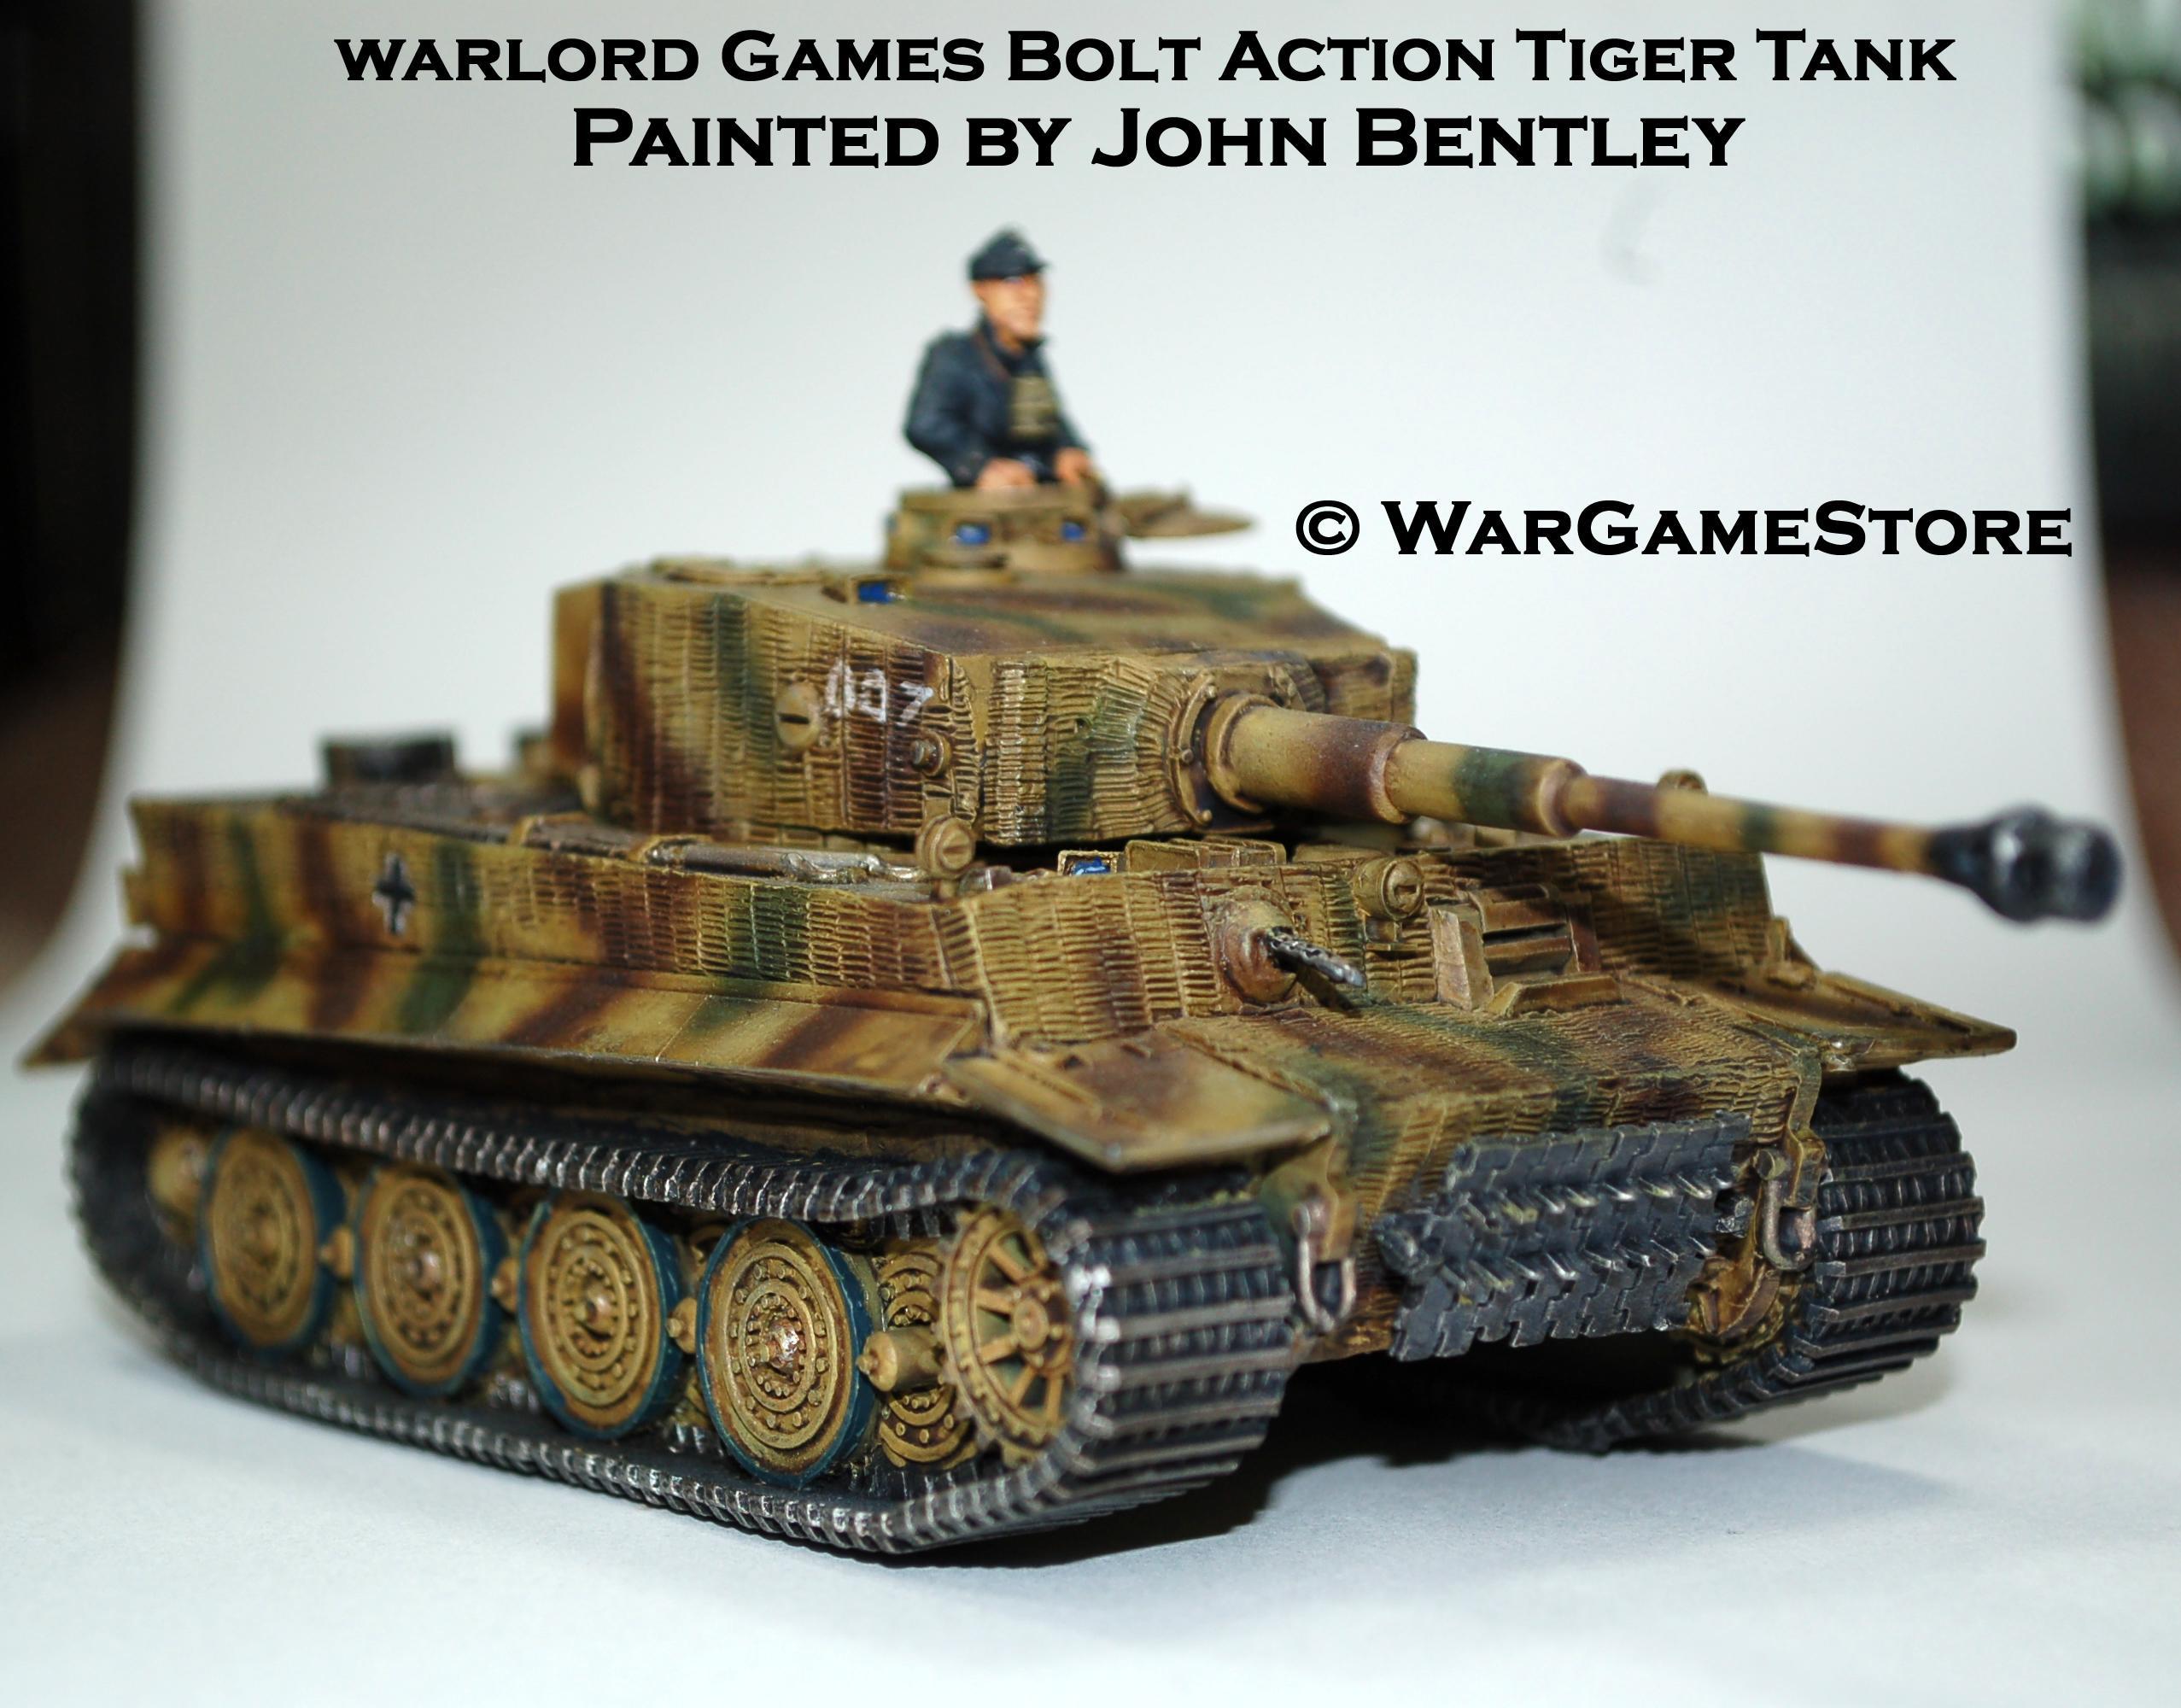 Tiger, Wargamestore, Warlord, Whitmann